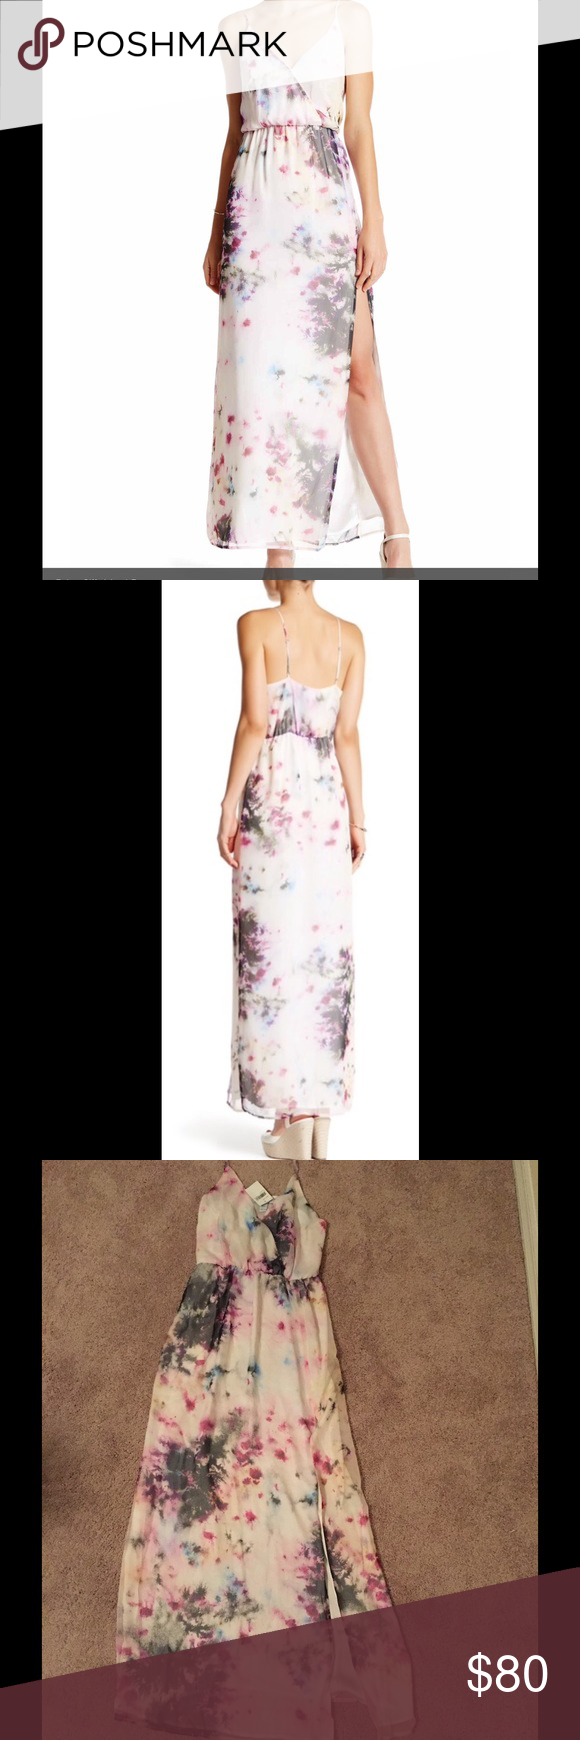 Overnight deal charlie jade maxi dress surplice neck with single